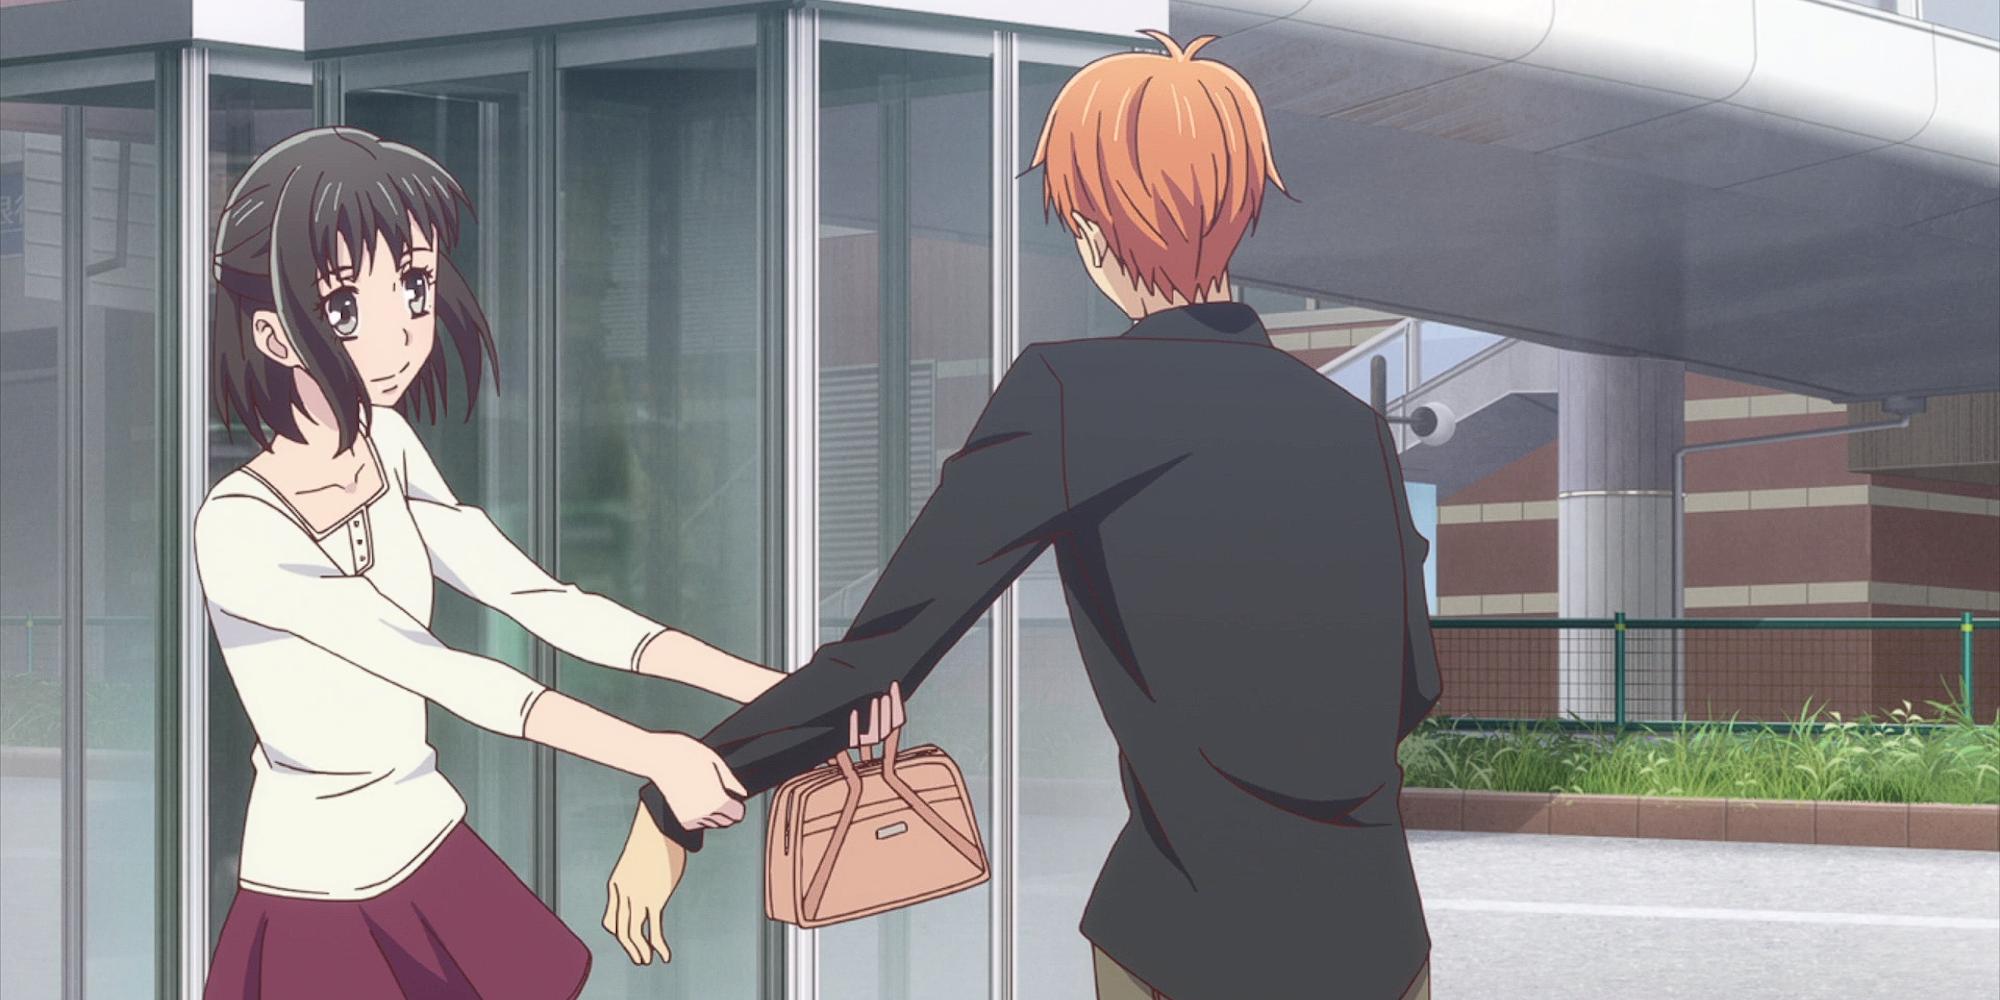 Fruits Basket Season 2, Episode 11: Kyo and Kagura's Date Gets Emotional